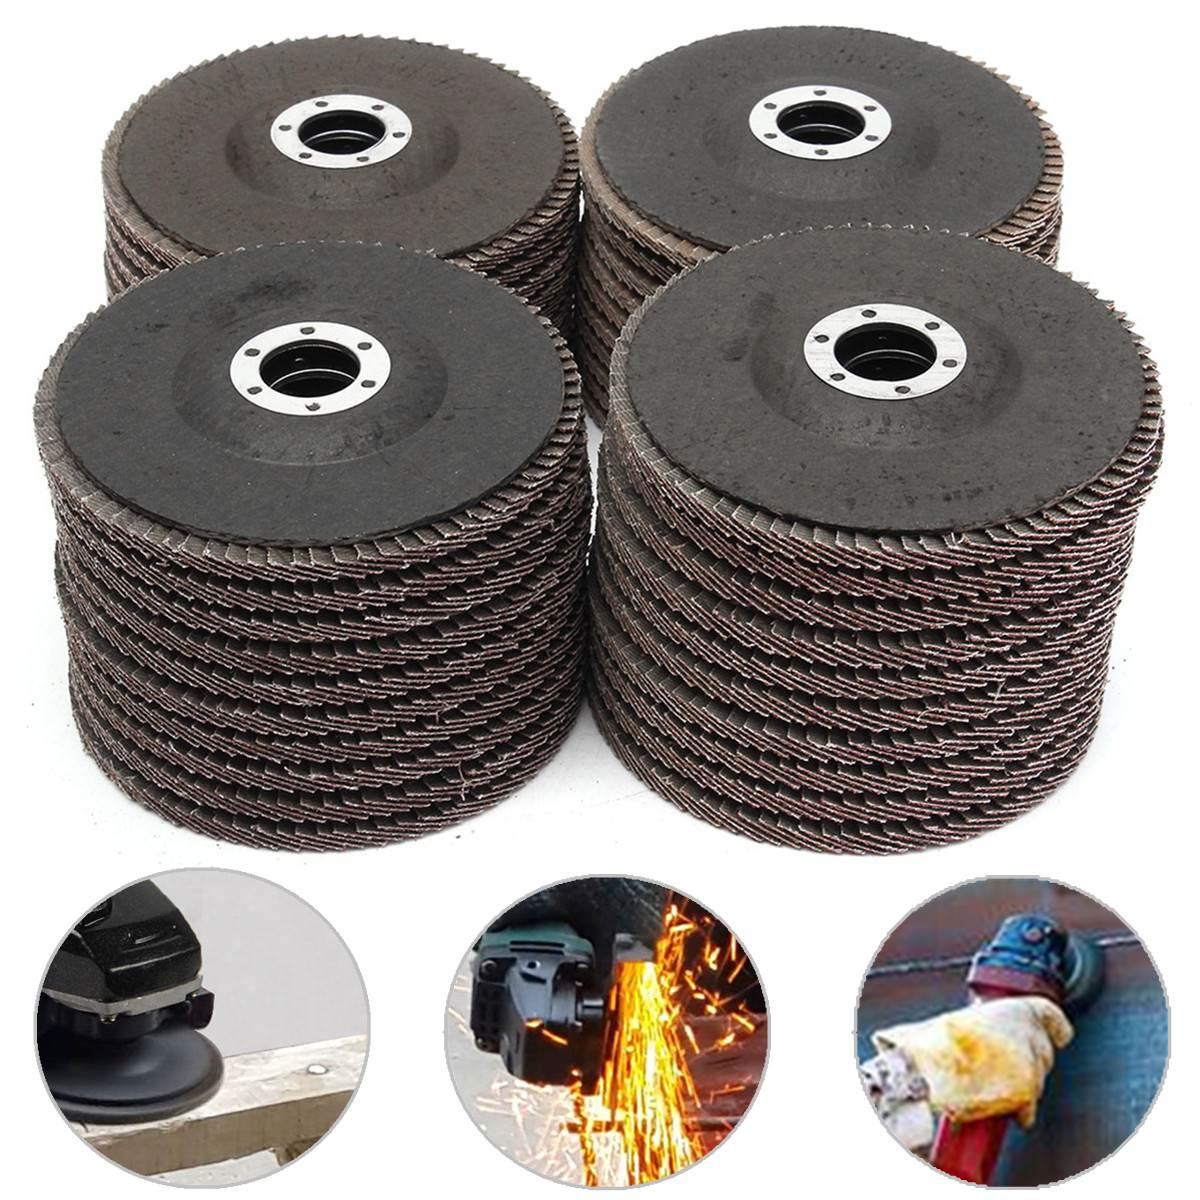 "10PCS/set 5"" 125mm Grit Aluminum Oxide Flap Disc 40/60/80/120 Sanding Grinding Wheels Applicable to General Metal Carbon Steel"